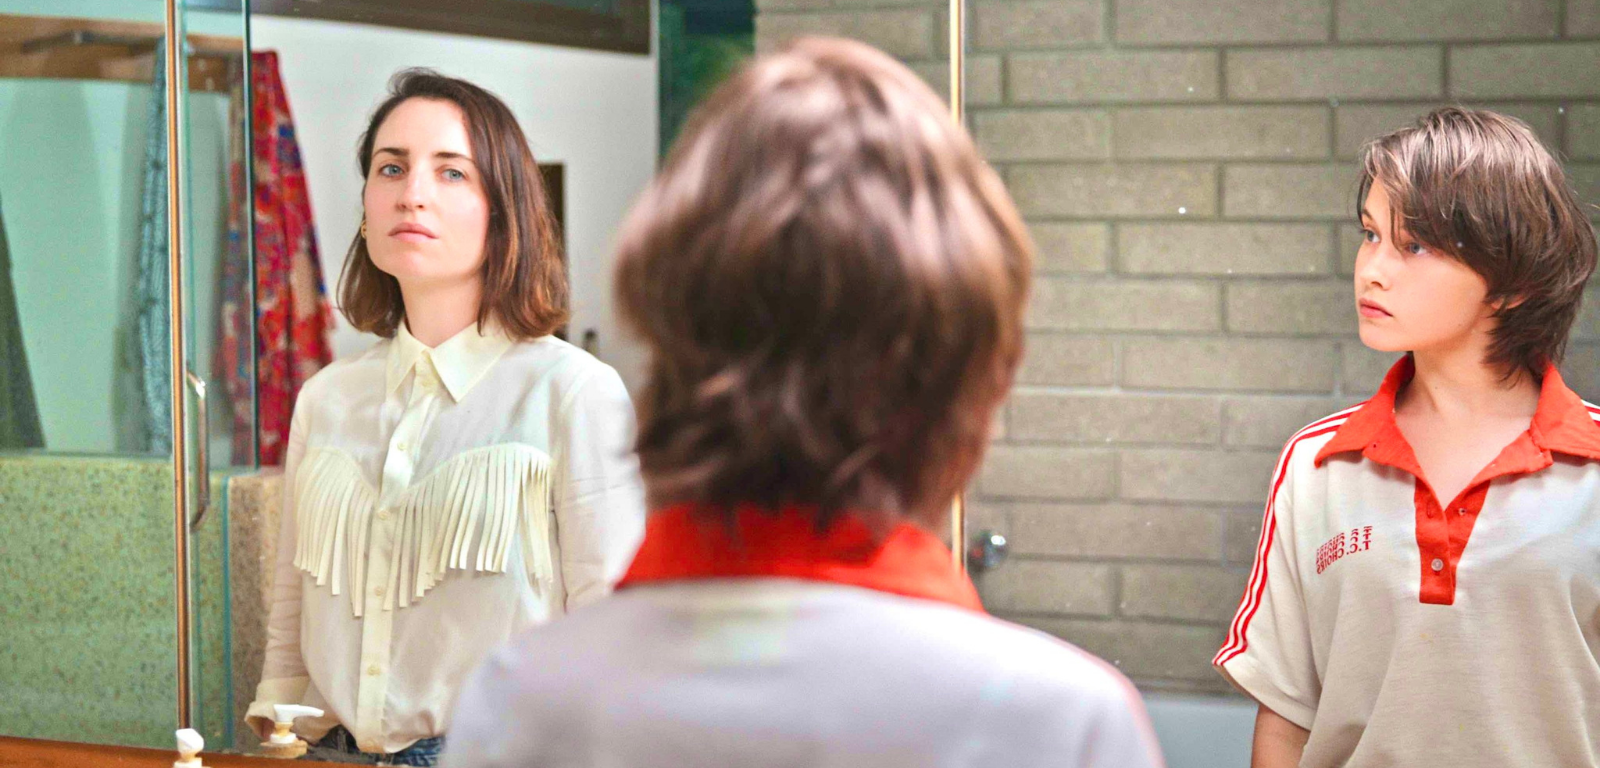 How It Ends 2021 Zoe Lister Jones movie